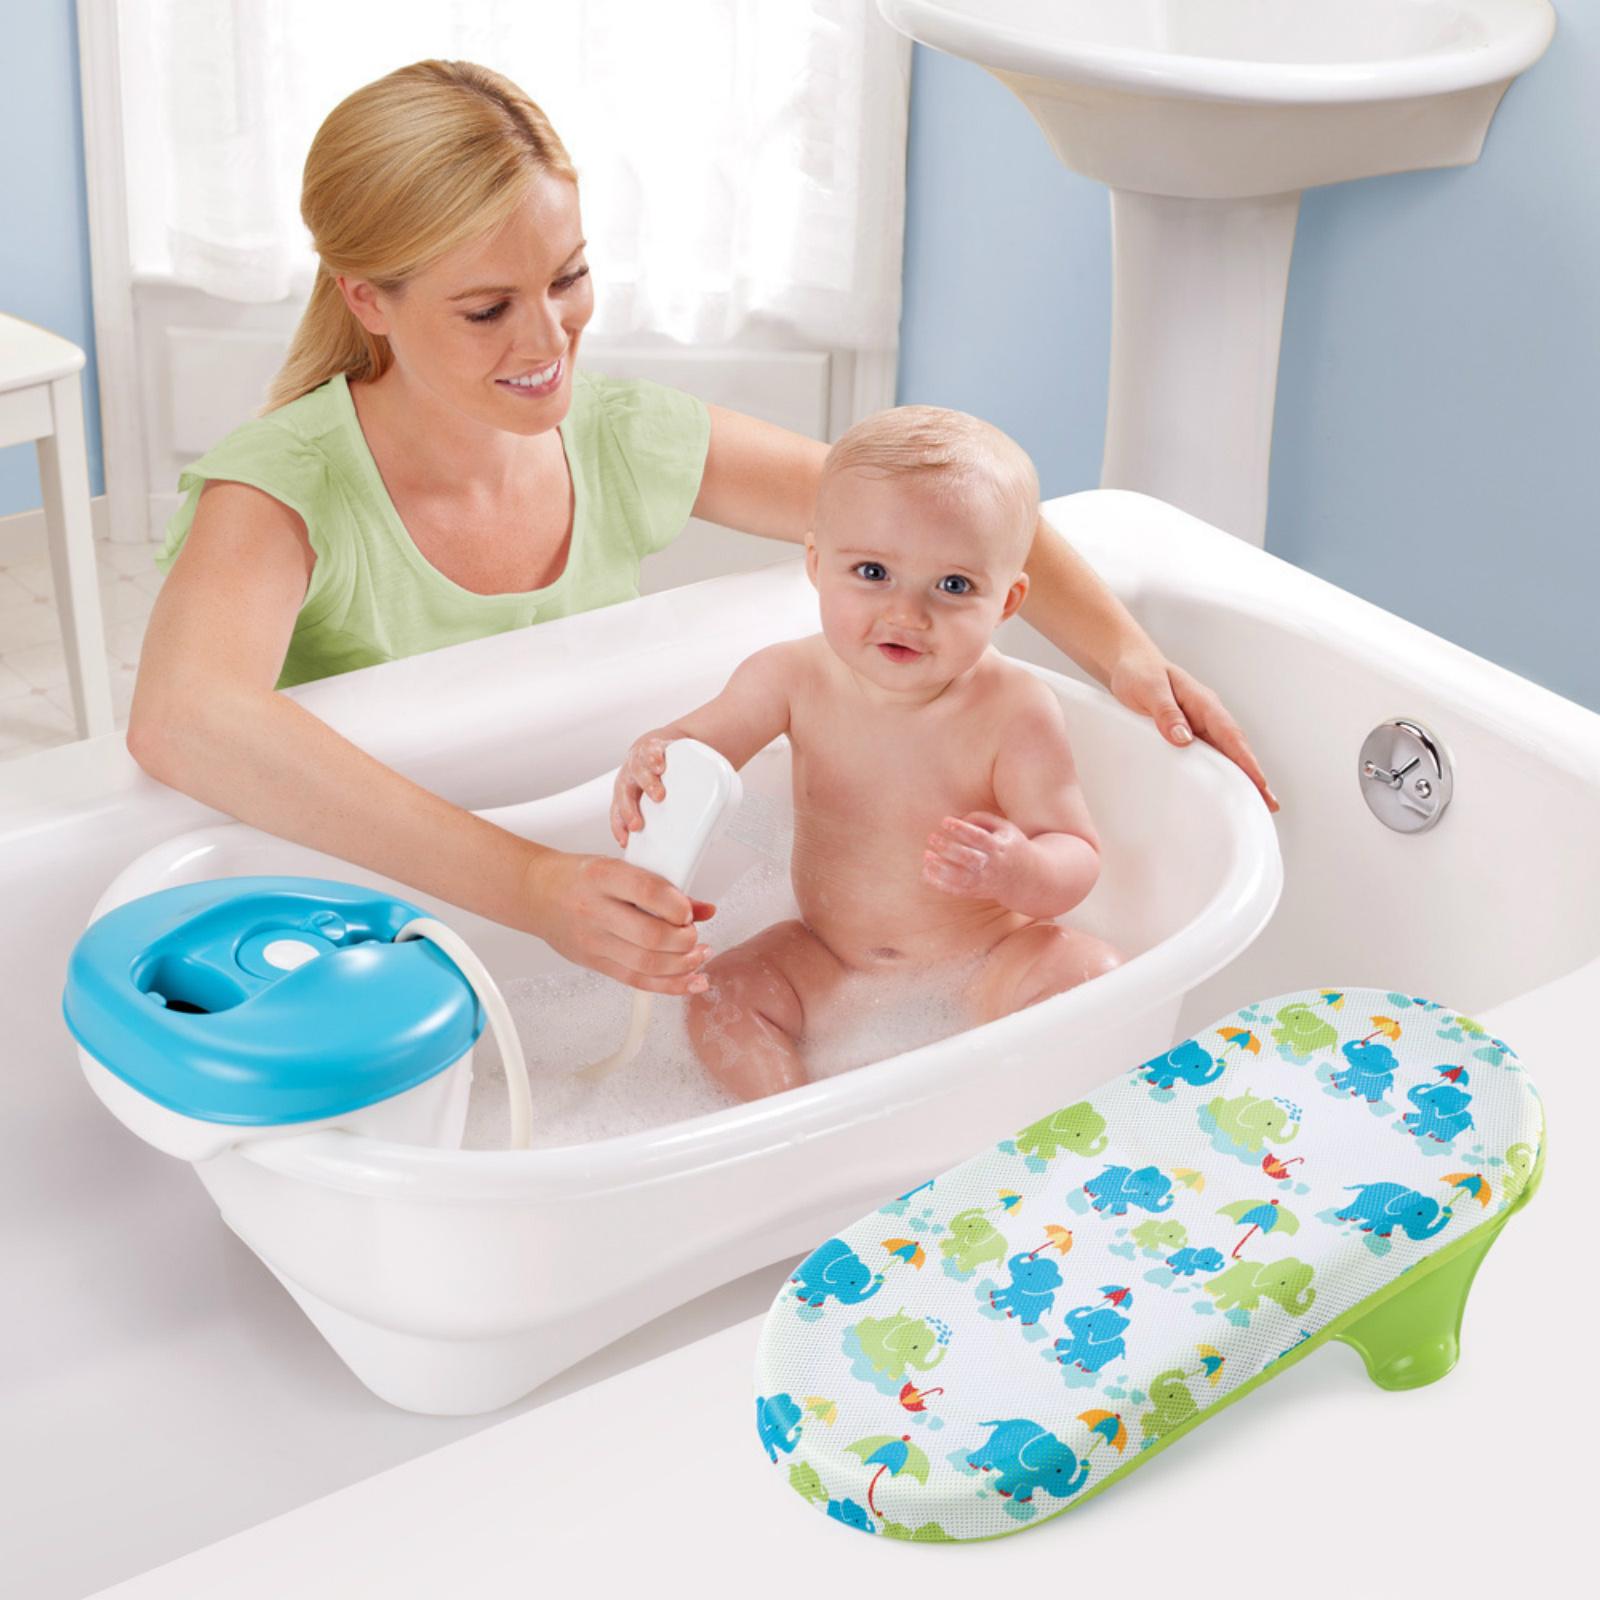 Baby Shower Tub Seat For Newborns Sling Wash Spa Summer Center ...